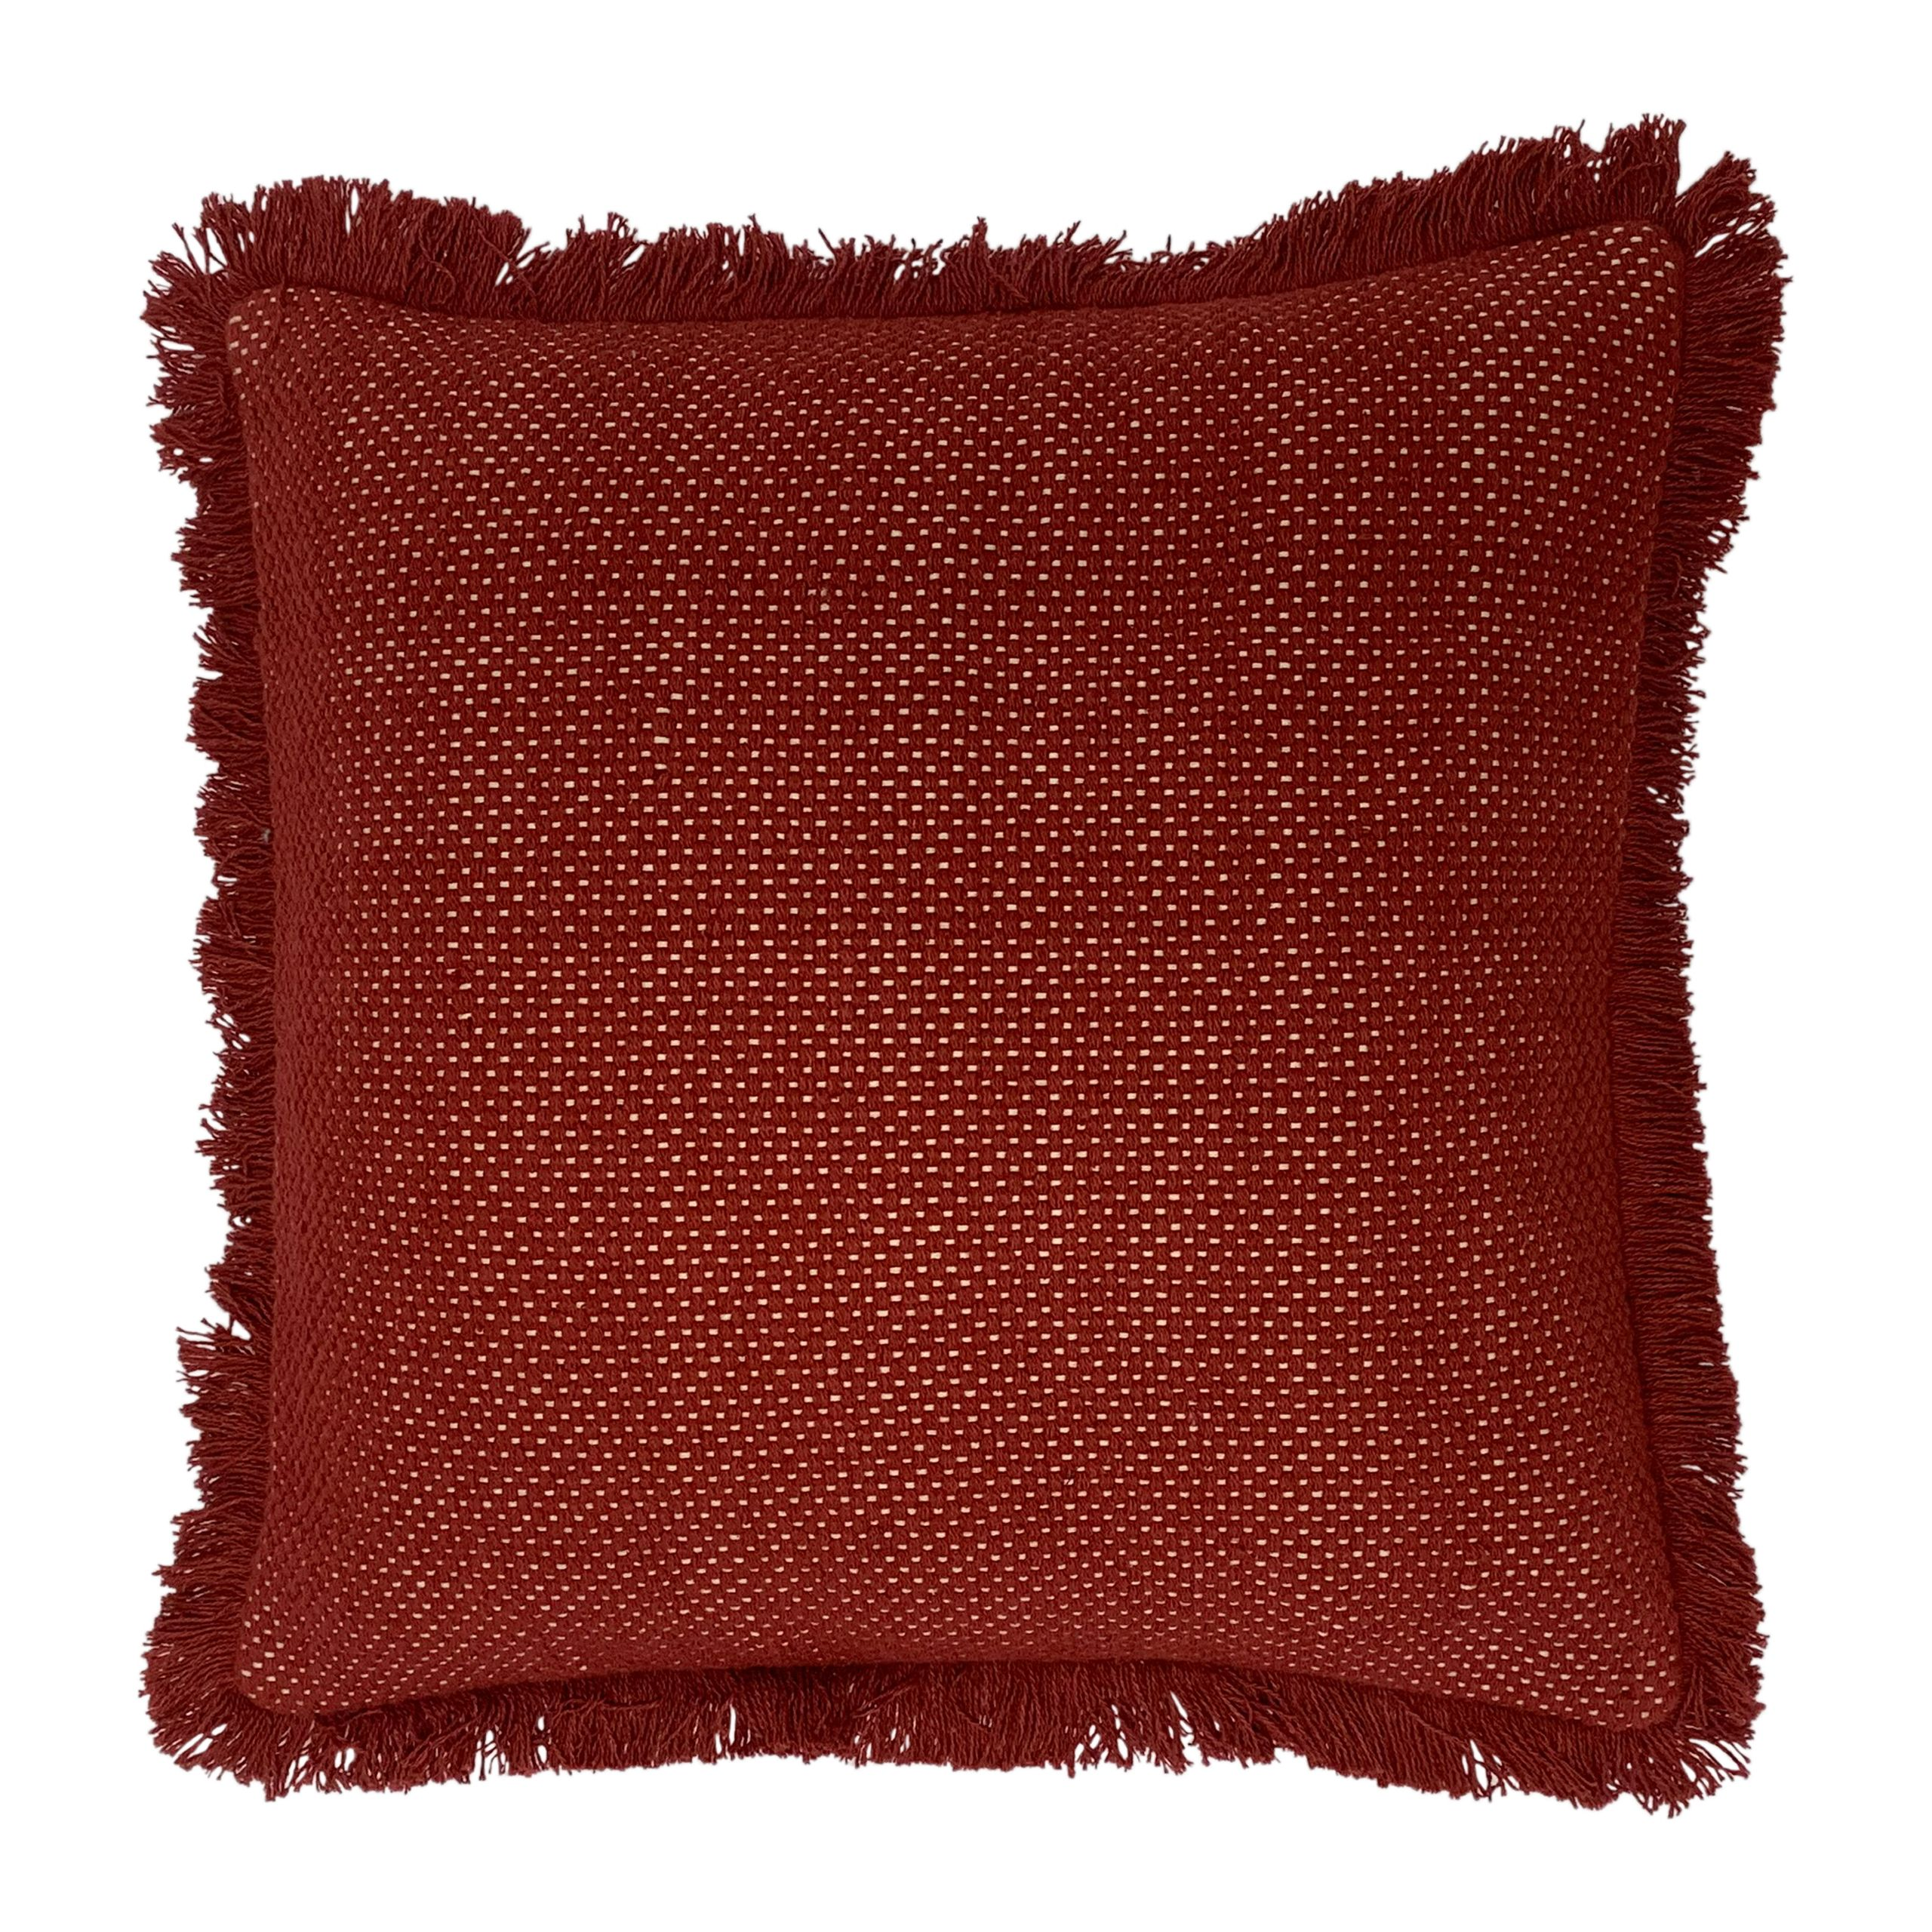 Sienna 45X45 Poly Cushion Brick